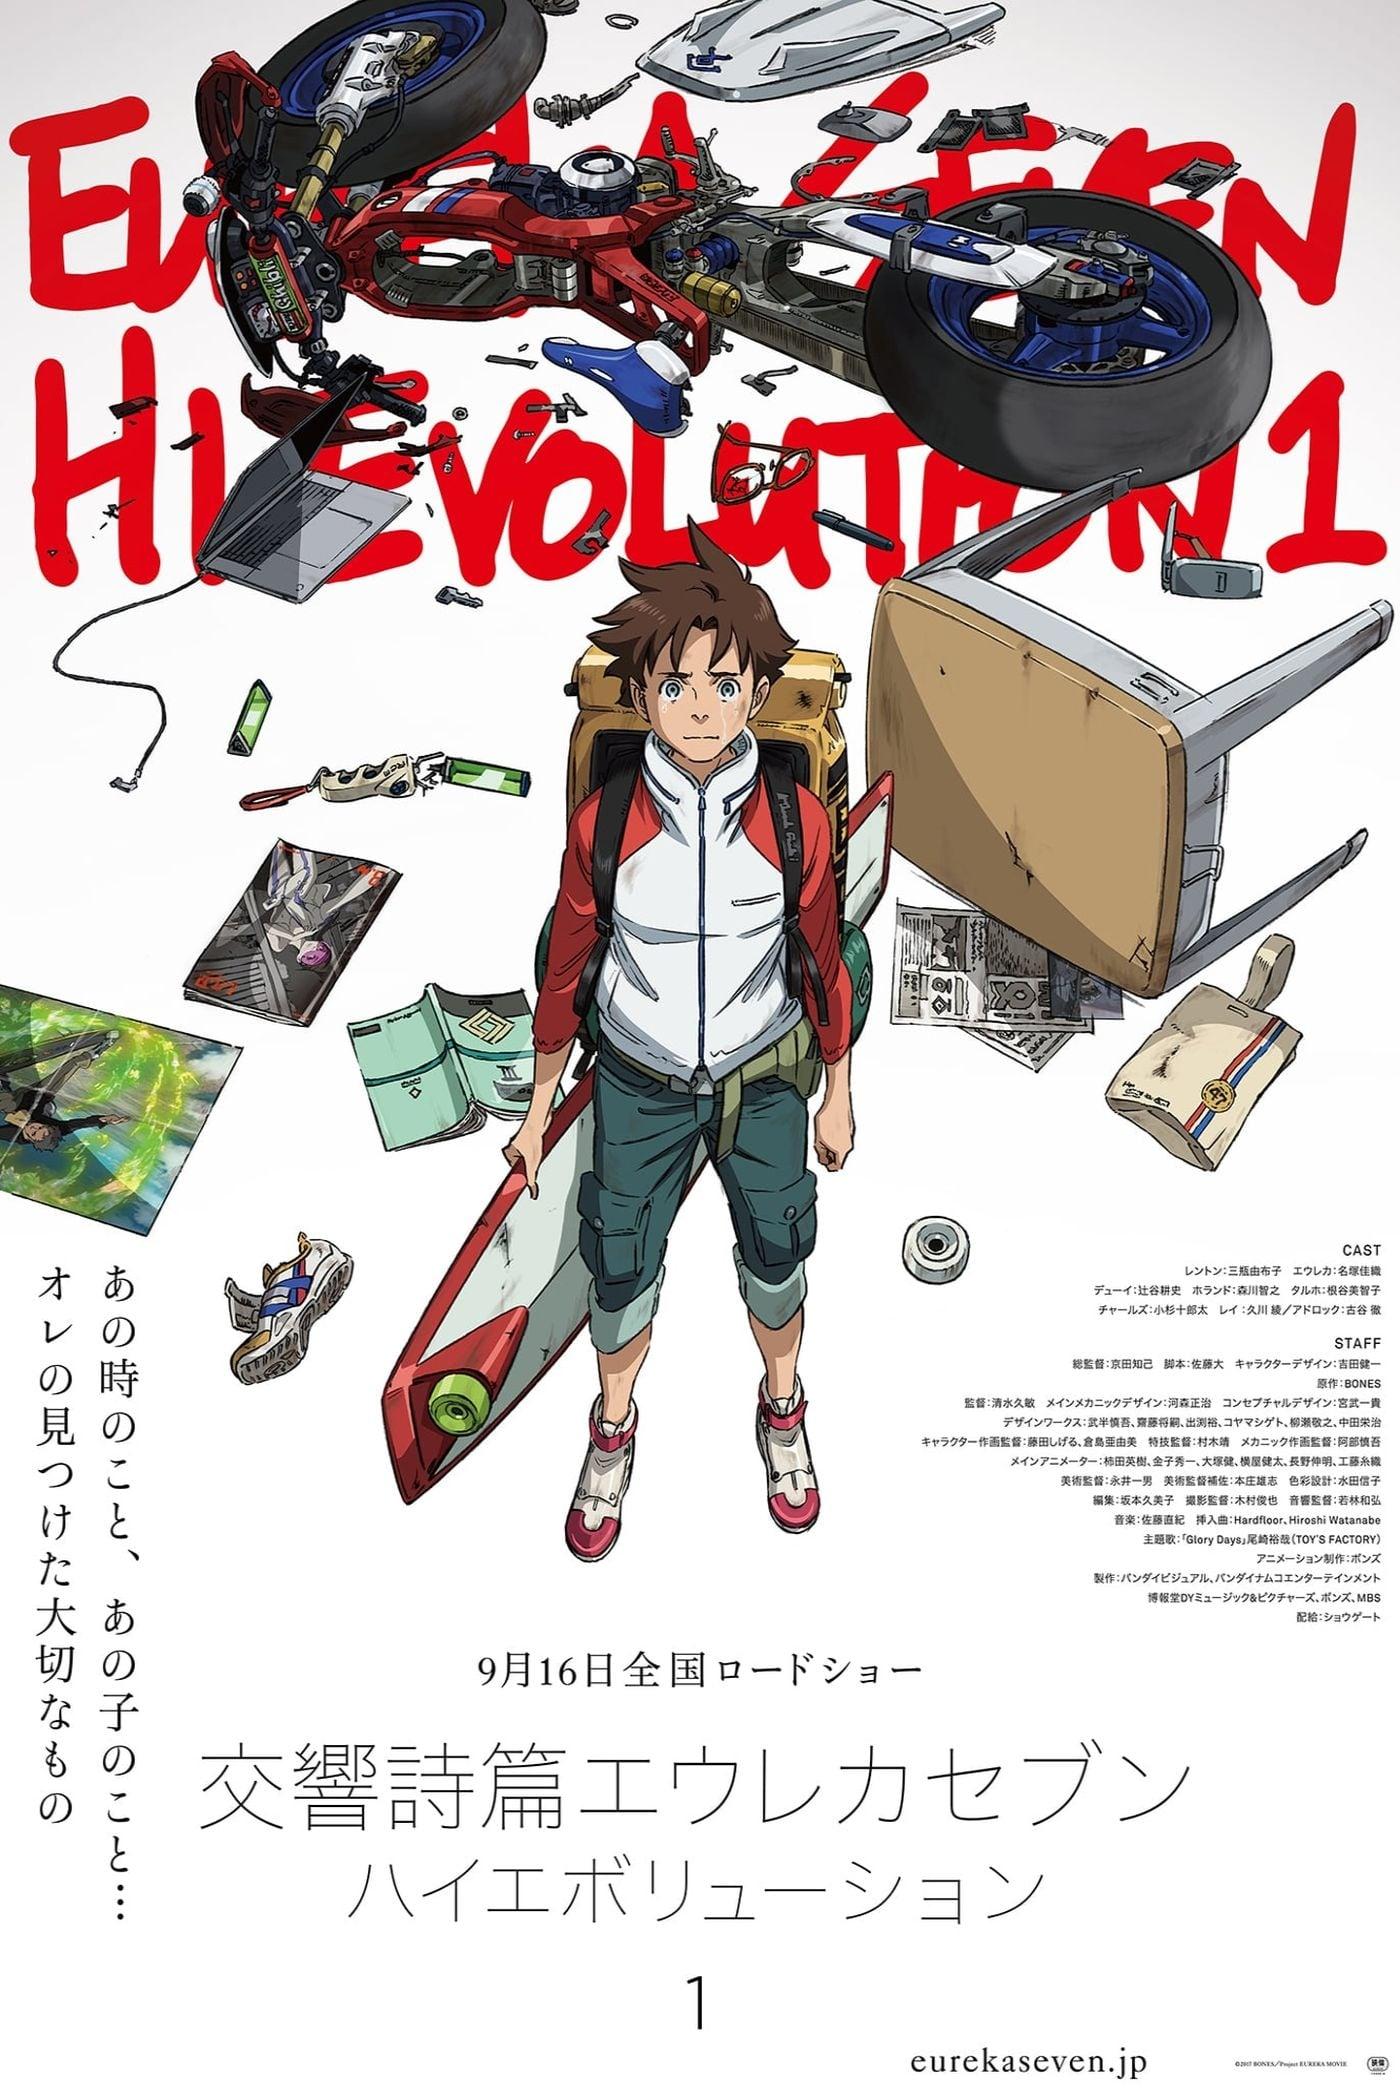 Koukyoushihen: Eureka Seven - Hi-Evolution 1 (2017)